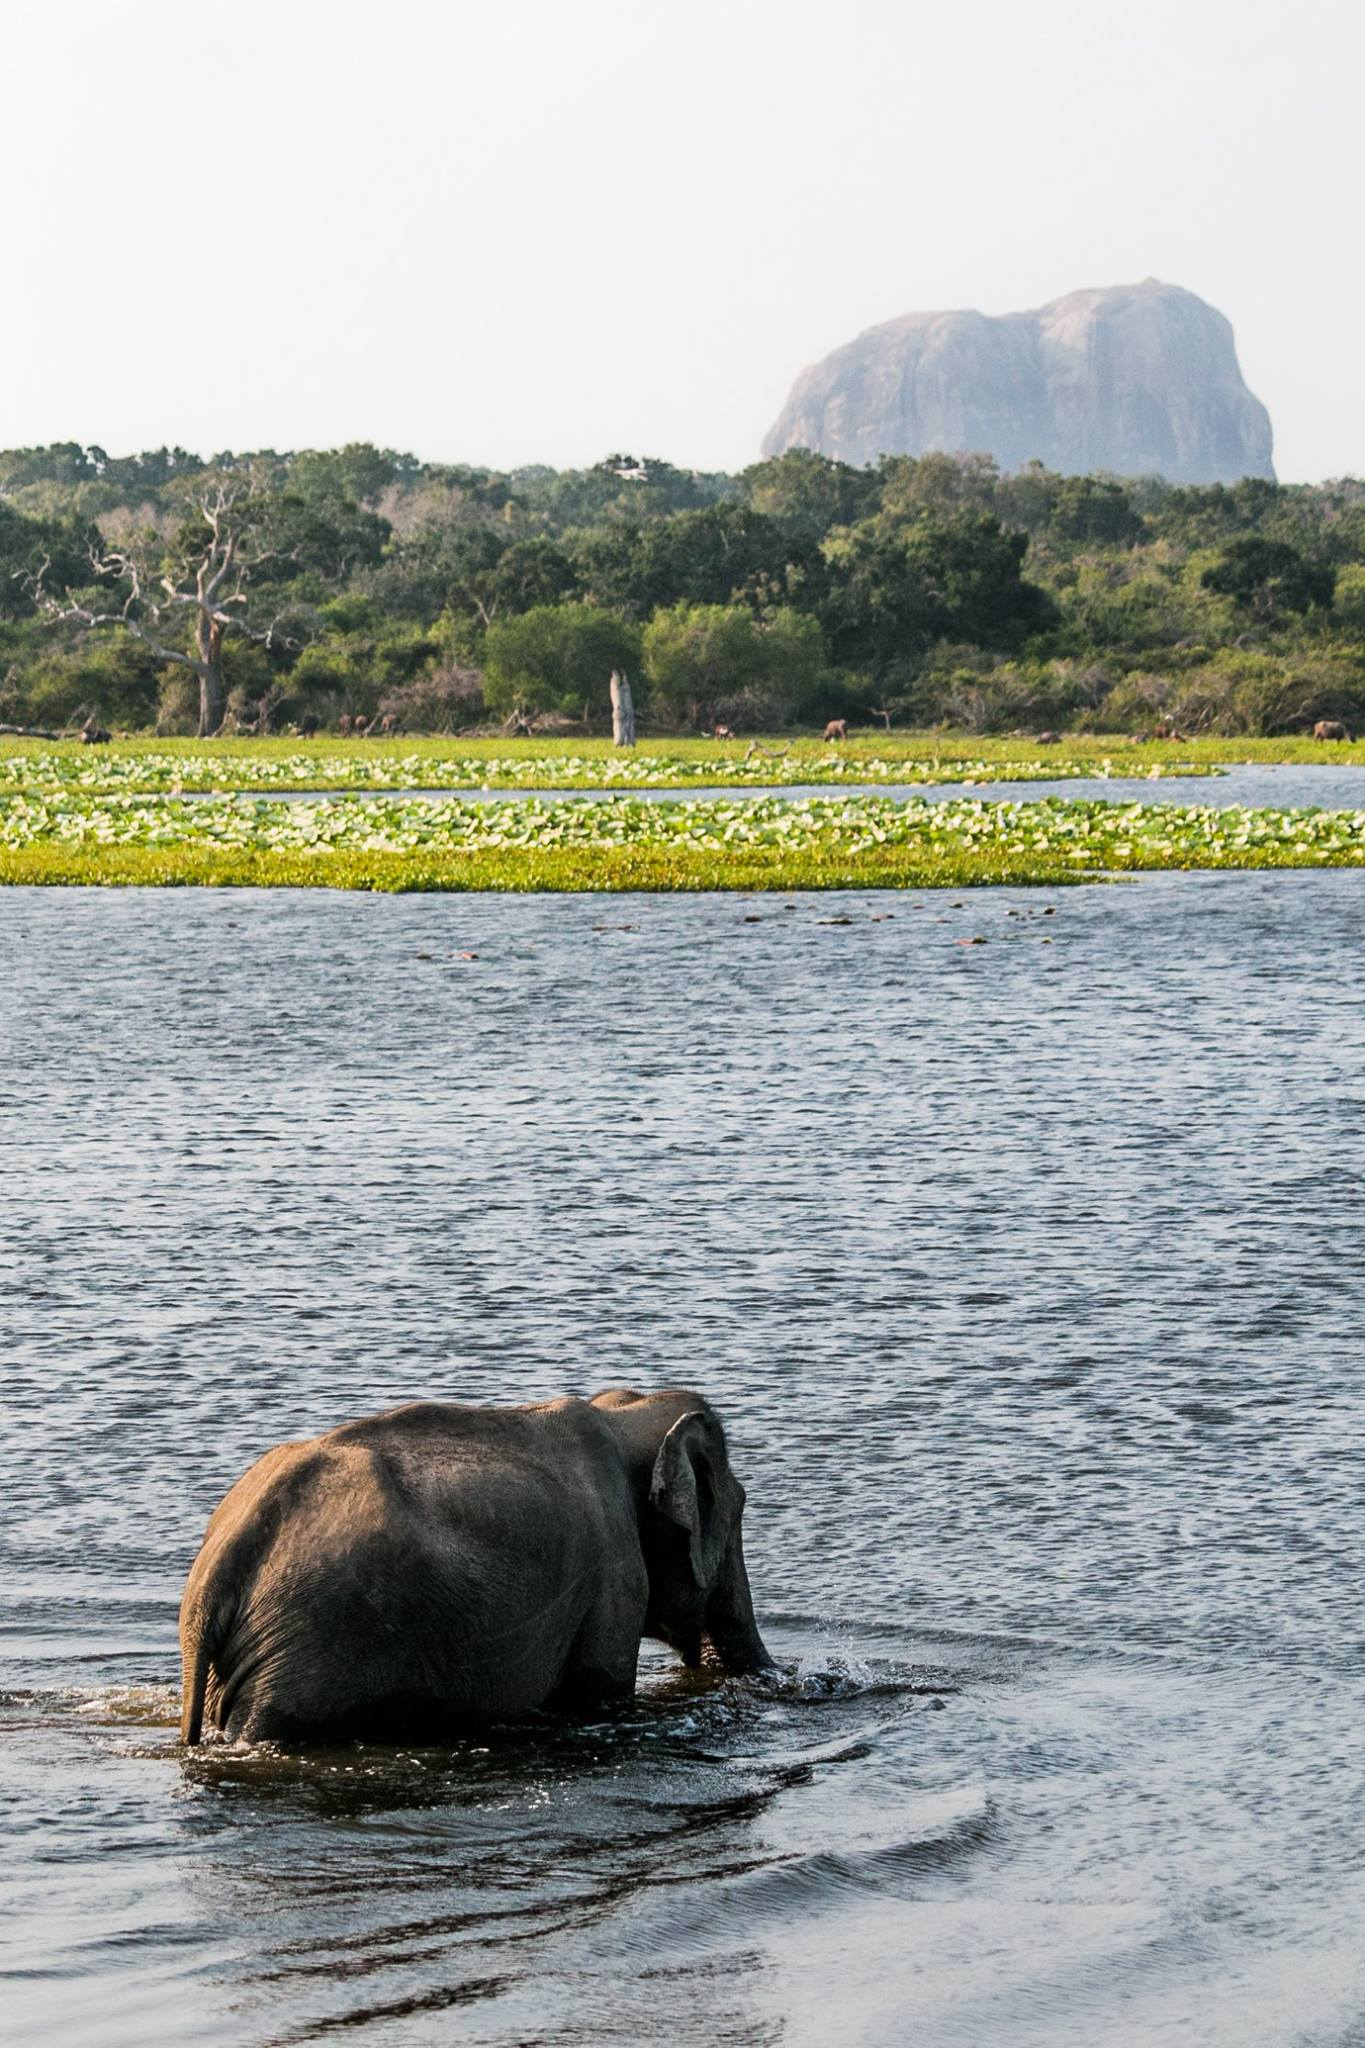 invite-to-paradise-sri-lanka-and-maldives-specialists-travel-agent-tour-operator-customer-review-feedback-joel-rhian-elephant-7.jpg